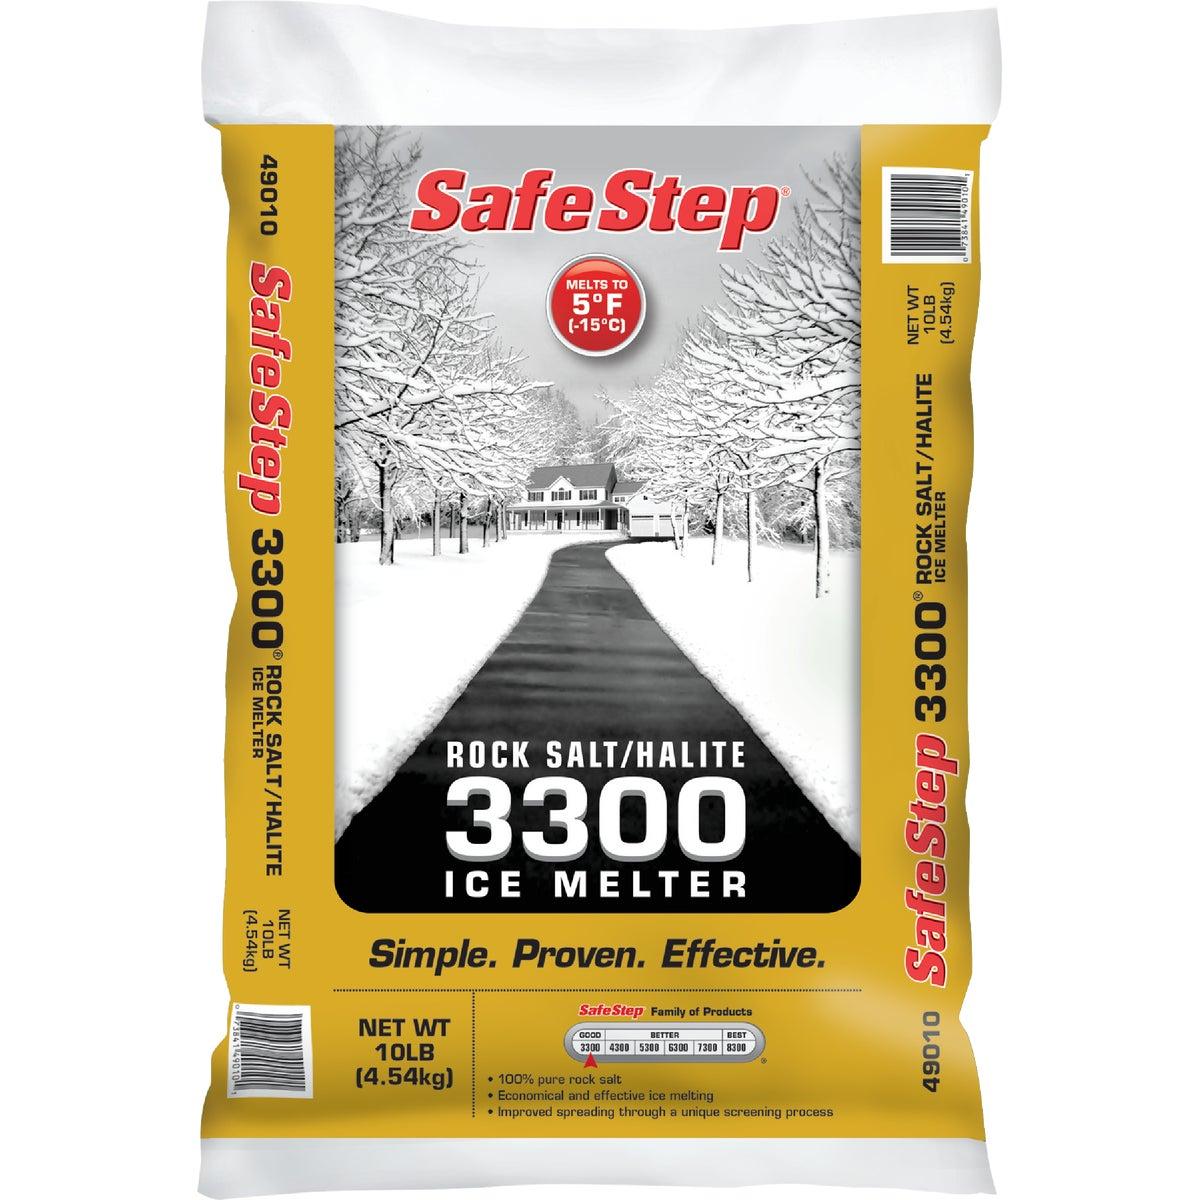 10LB SALT ICE MELTER